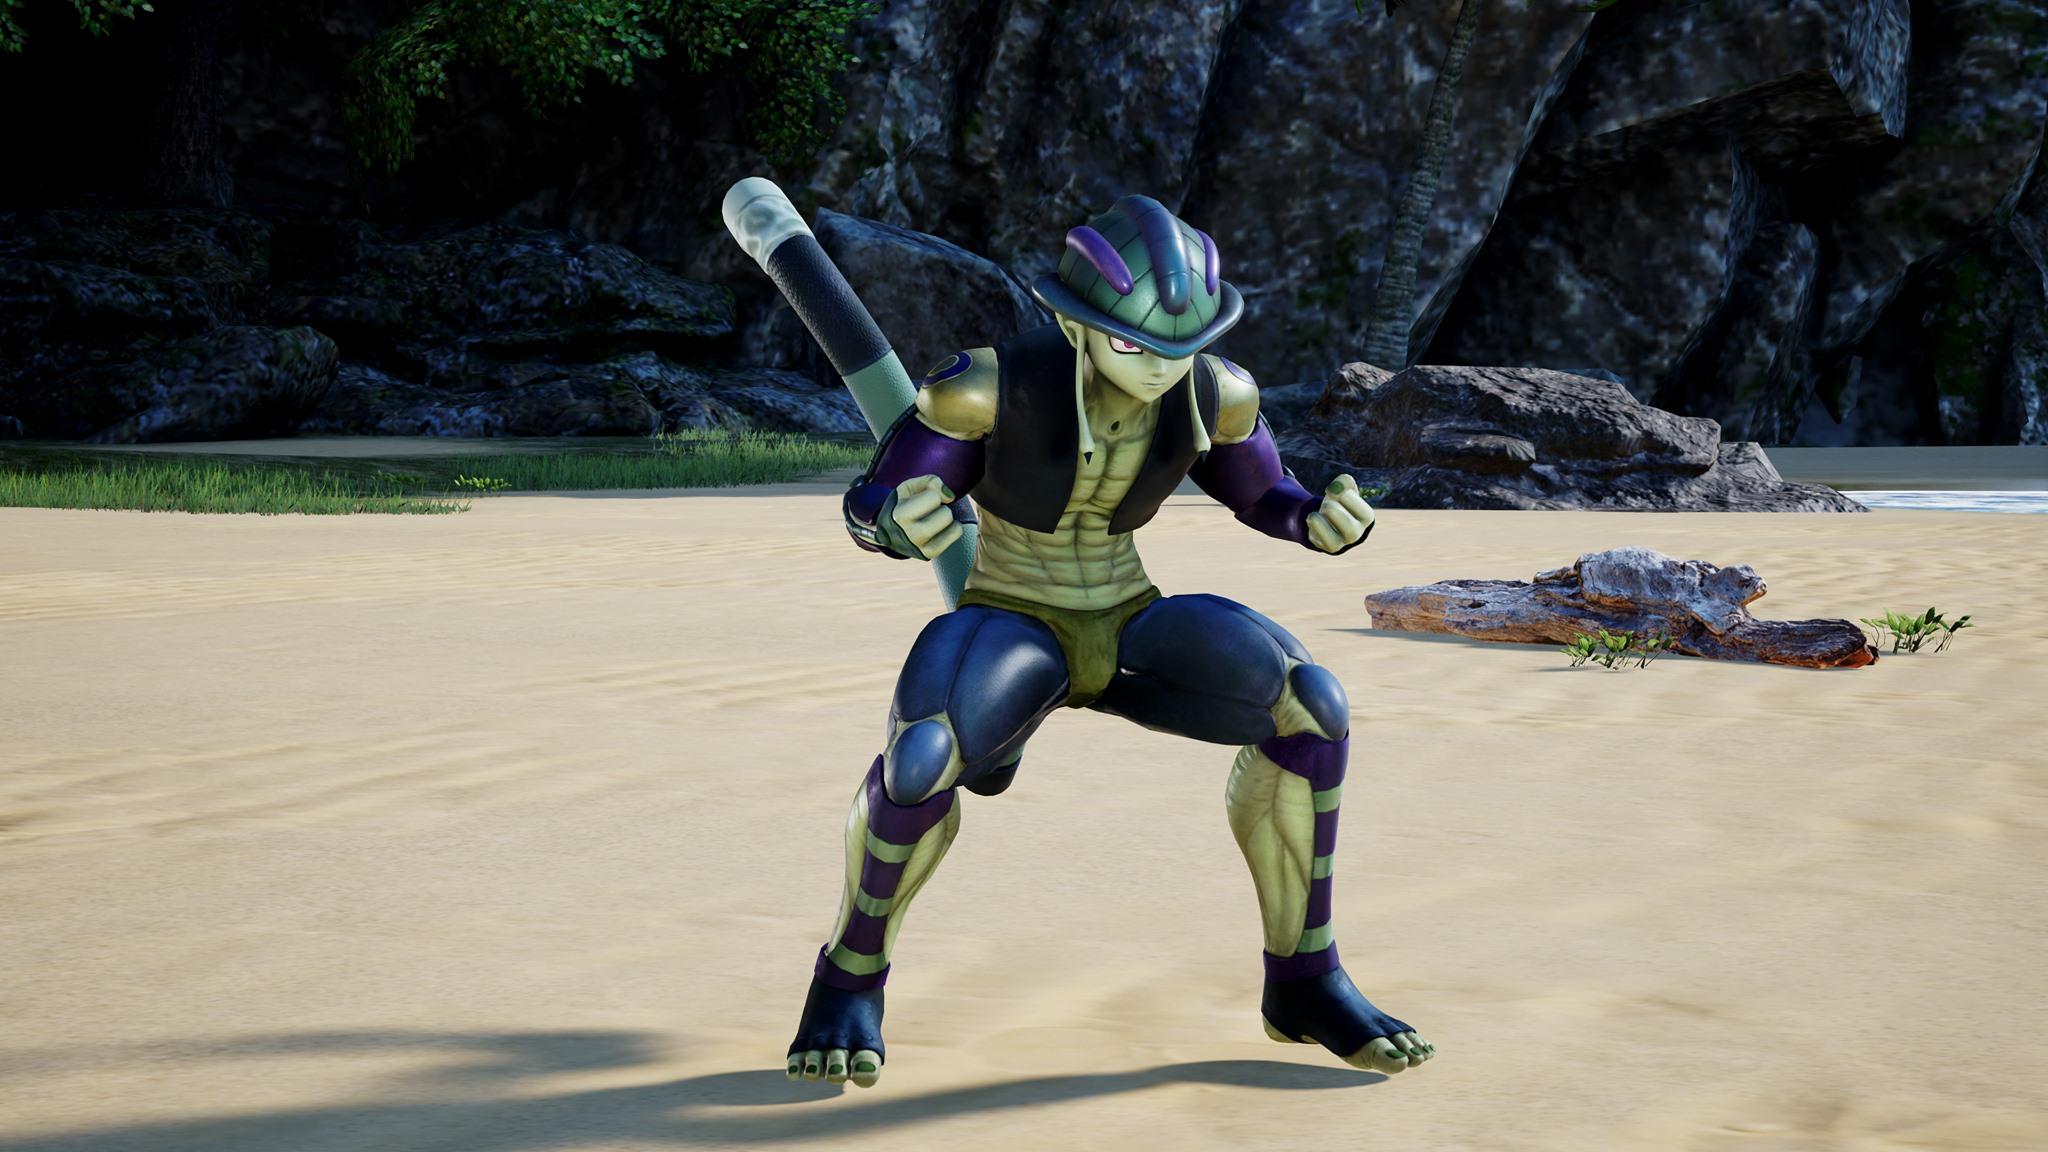 《Jump大乱斗》新DLC角色将于2020秋上线截图